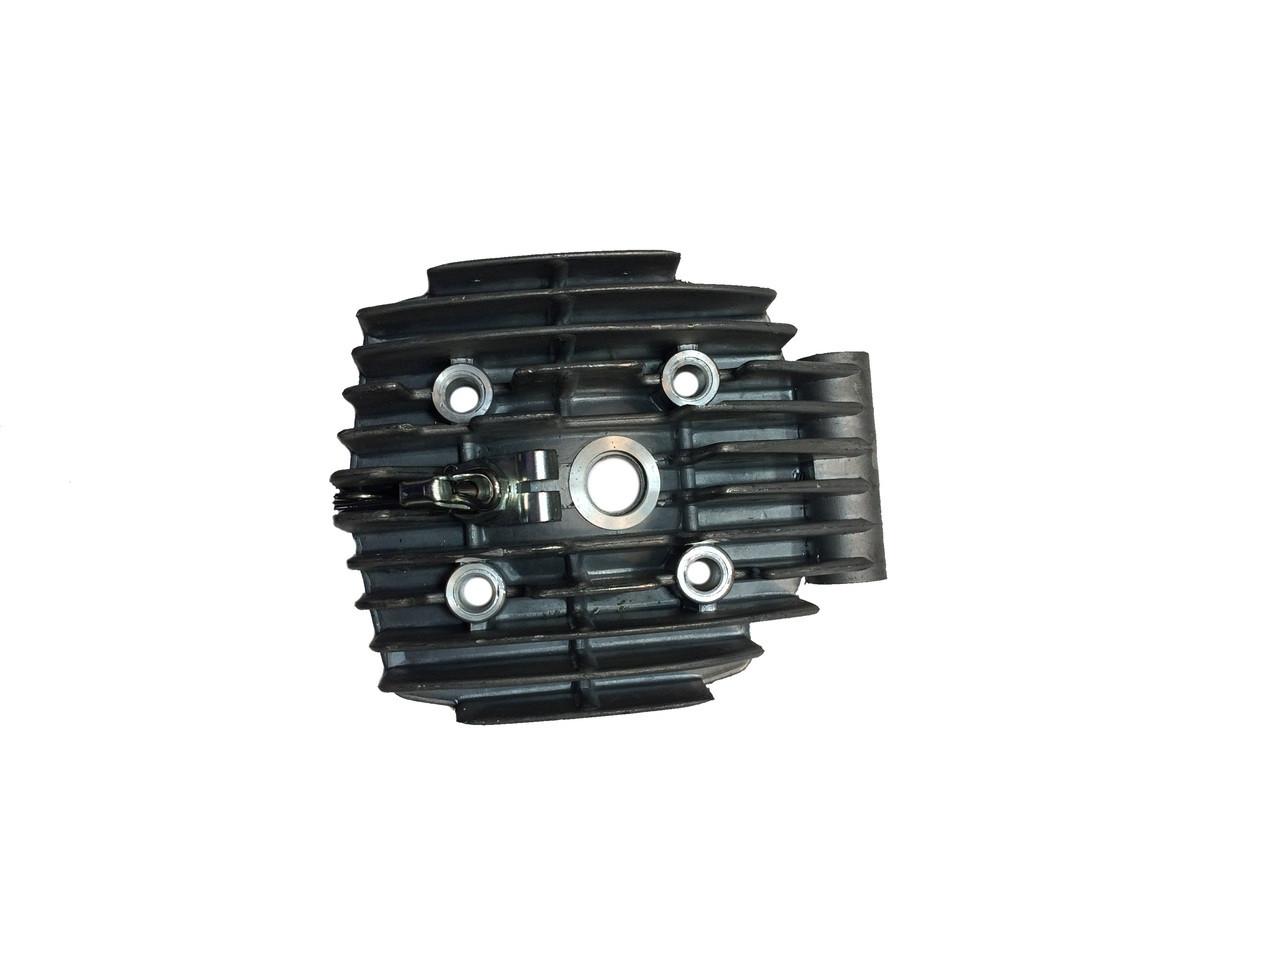 Motobecane AV7 50cc Cylinder Head W Decomp